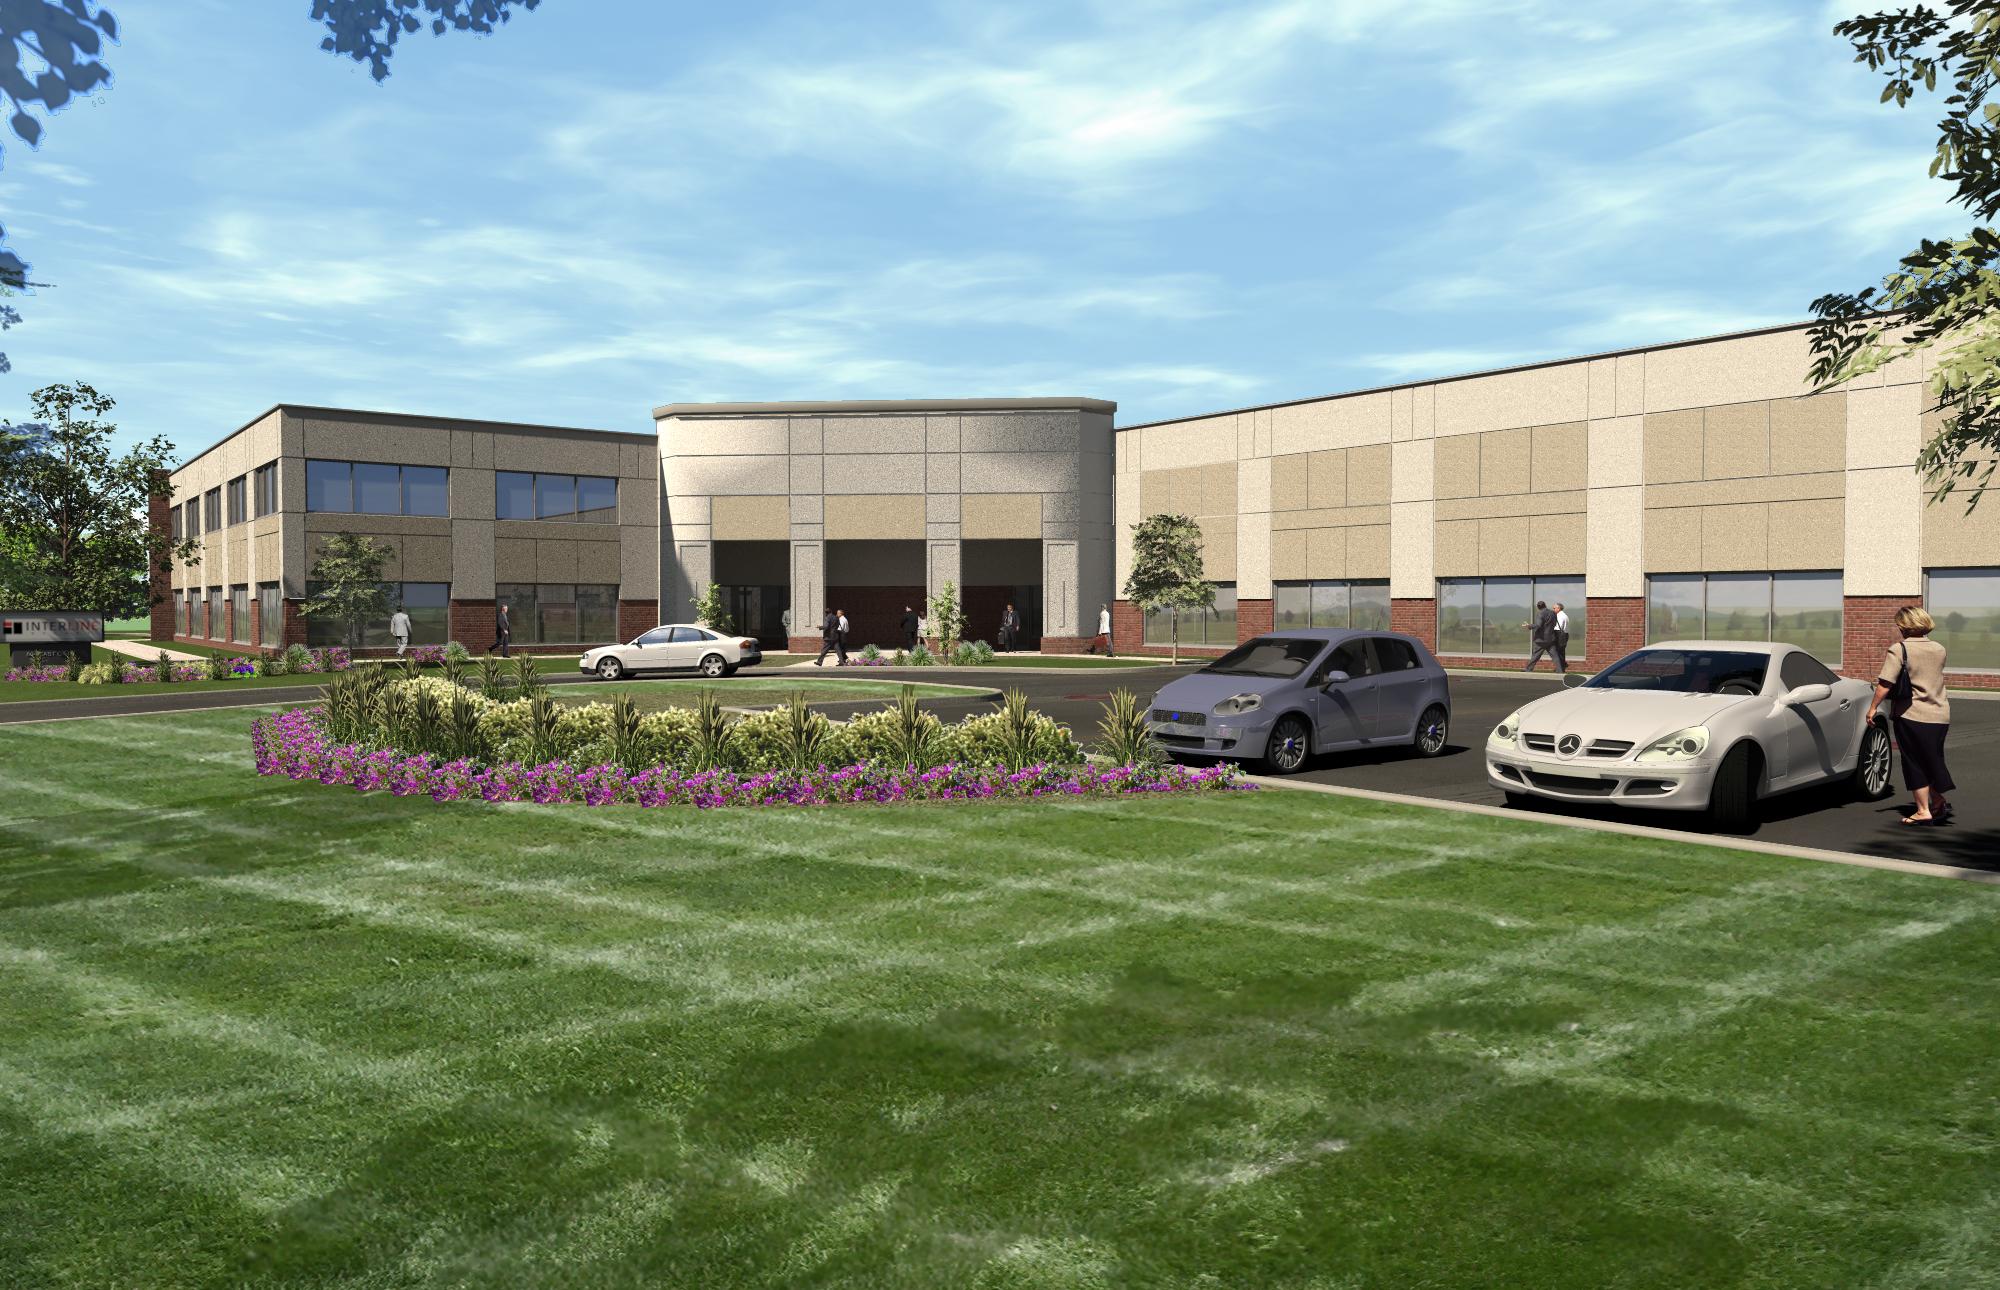 Facility-Mount-Laurel-Proposed-Renovation-4.jpg